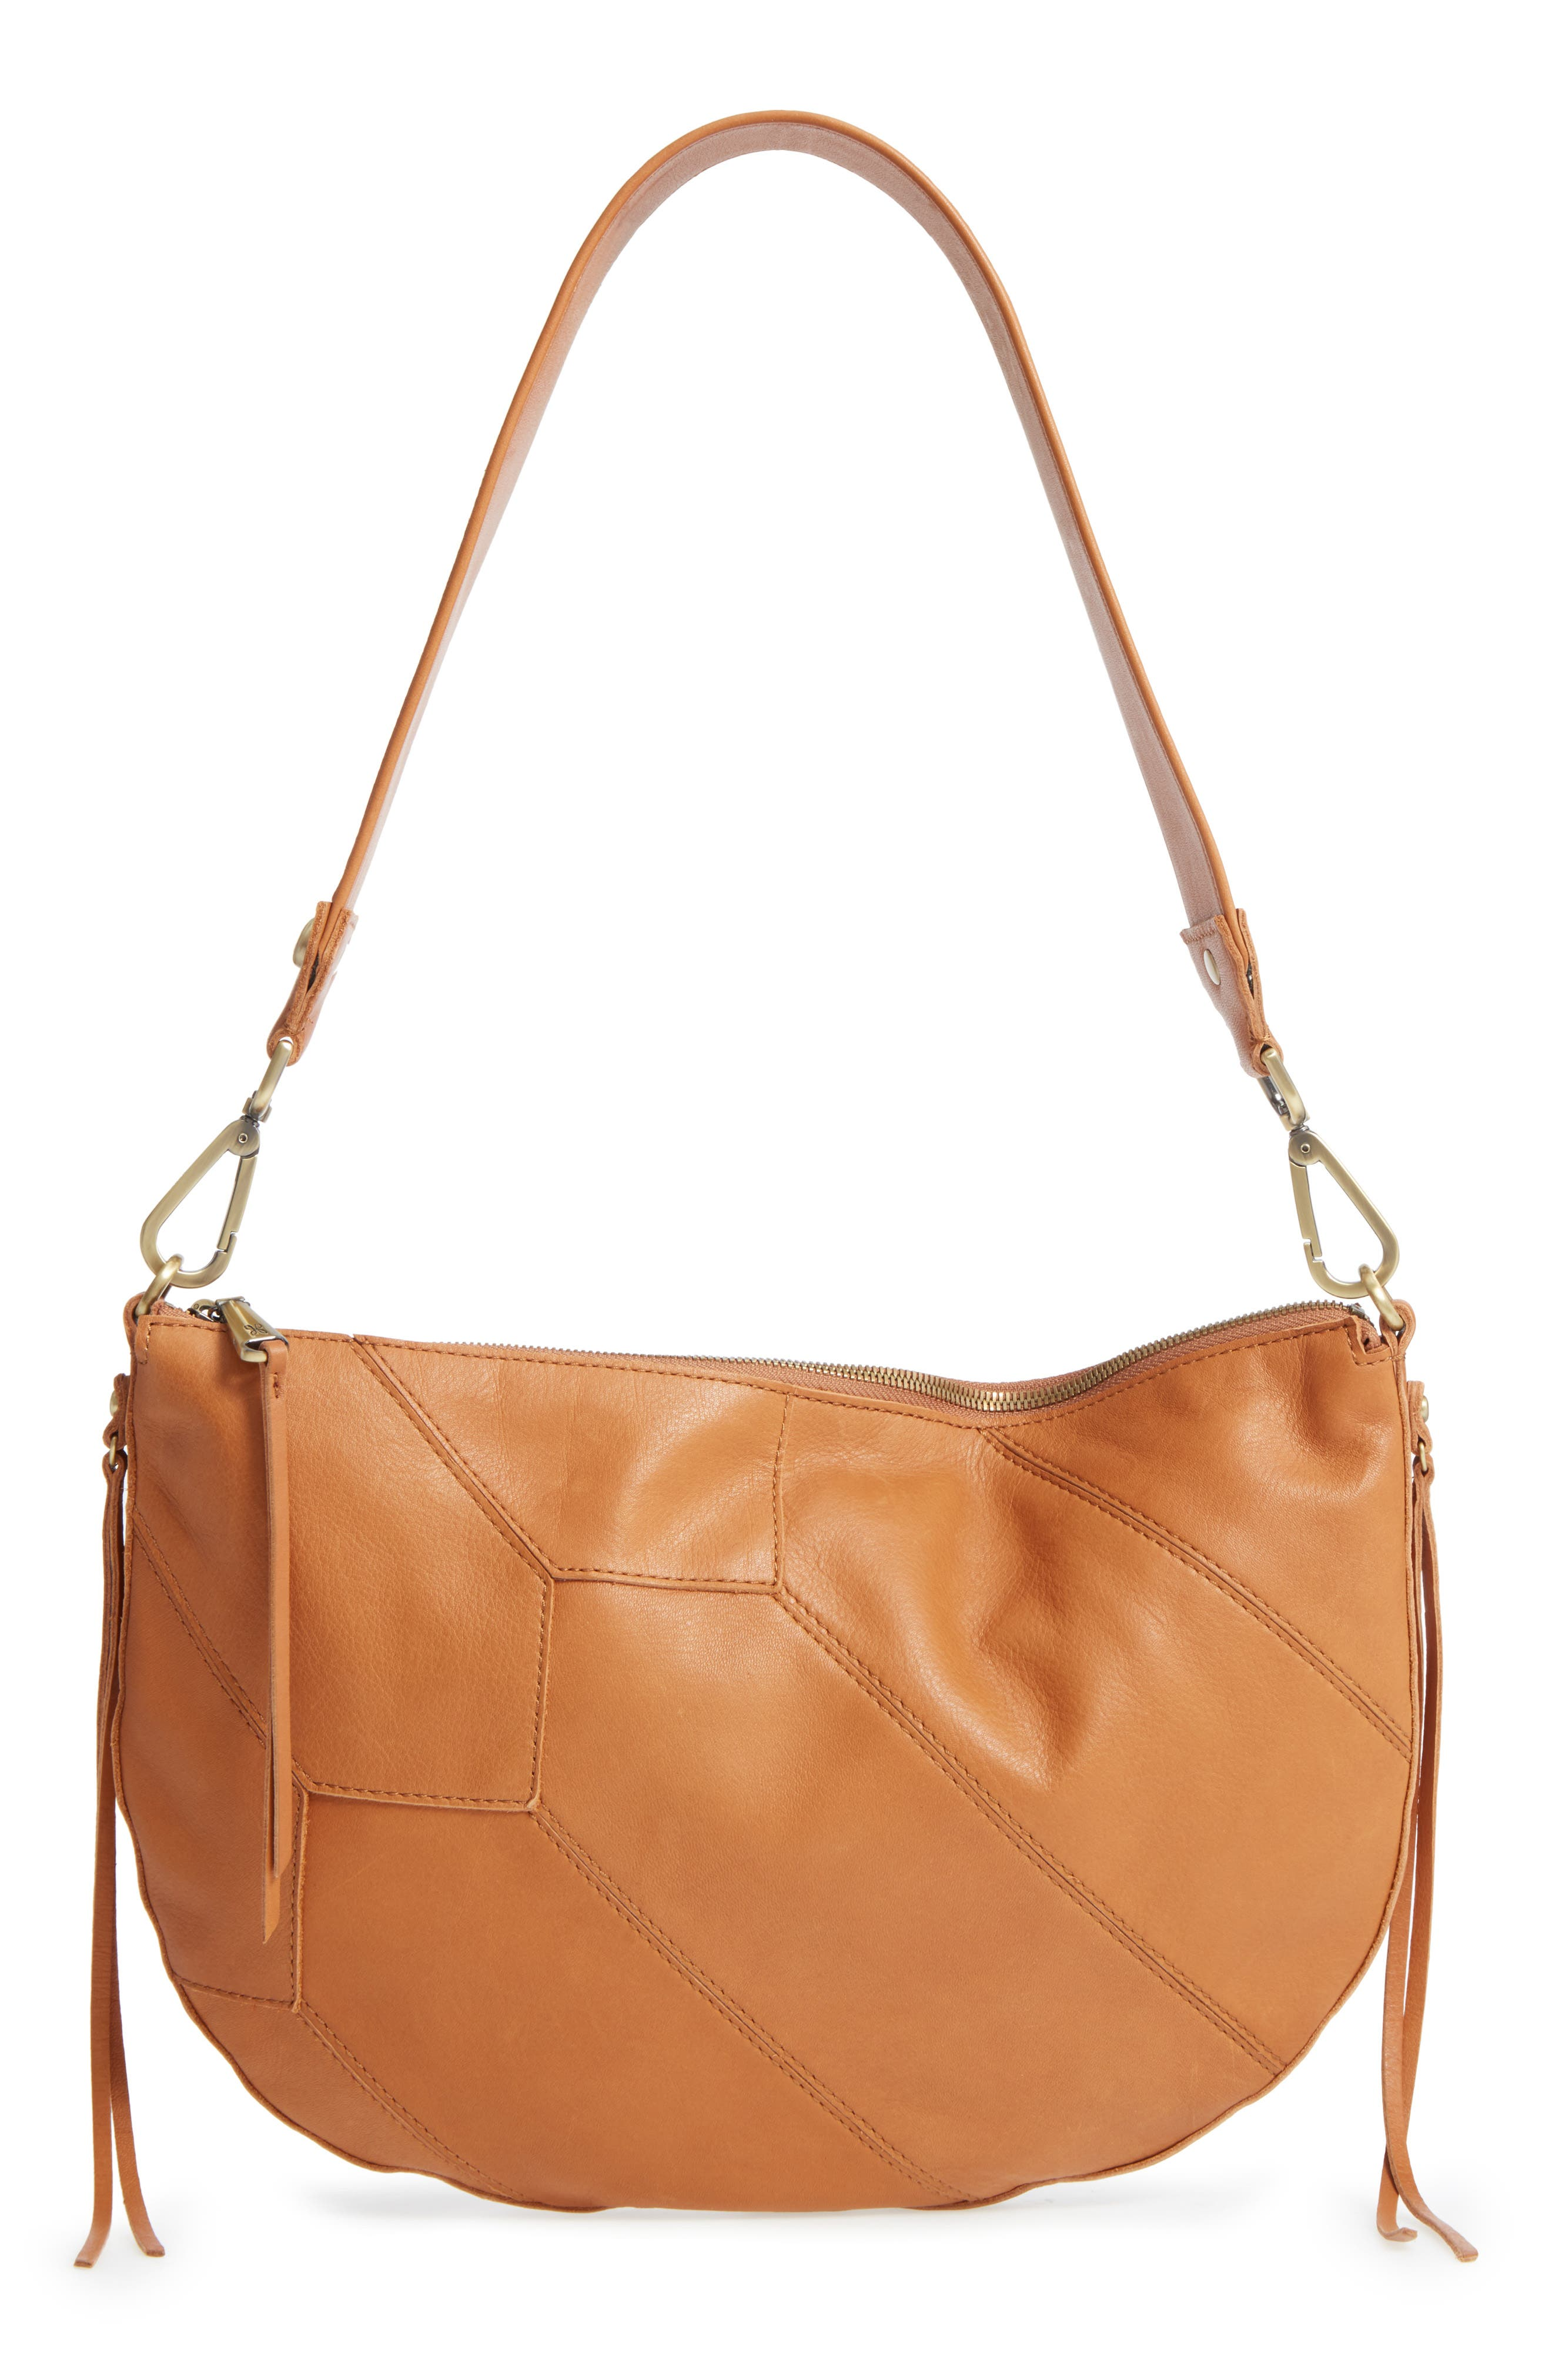 Cisco Calfskin Leather Hobo Bag,                             Main thumbnail 1, color,                             Natural